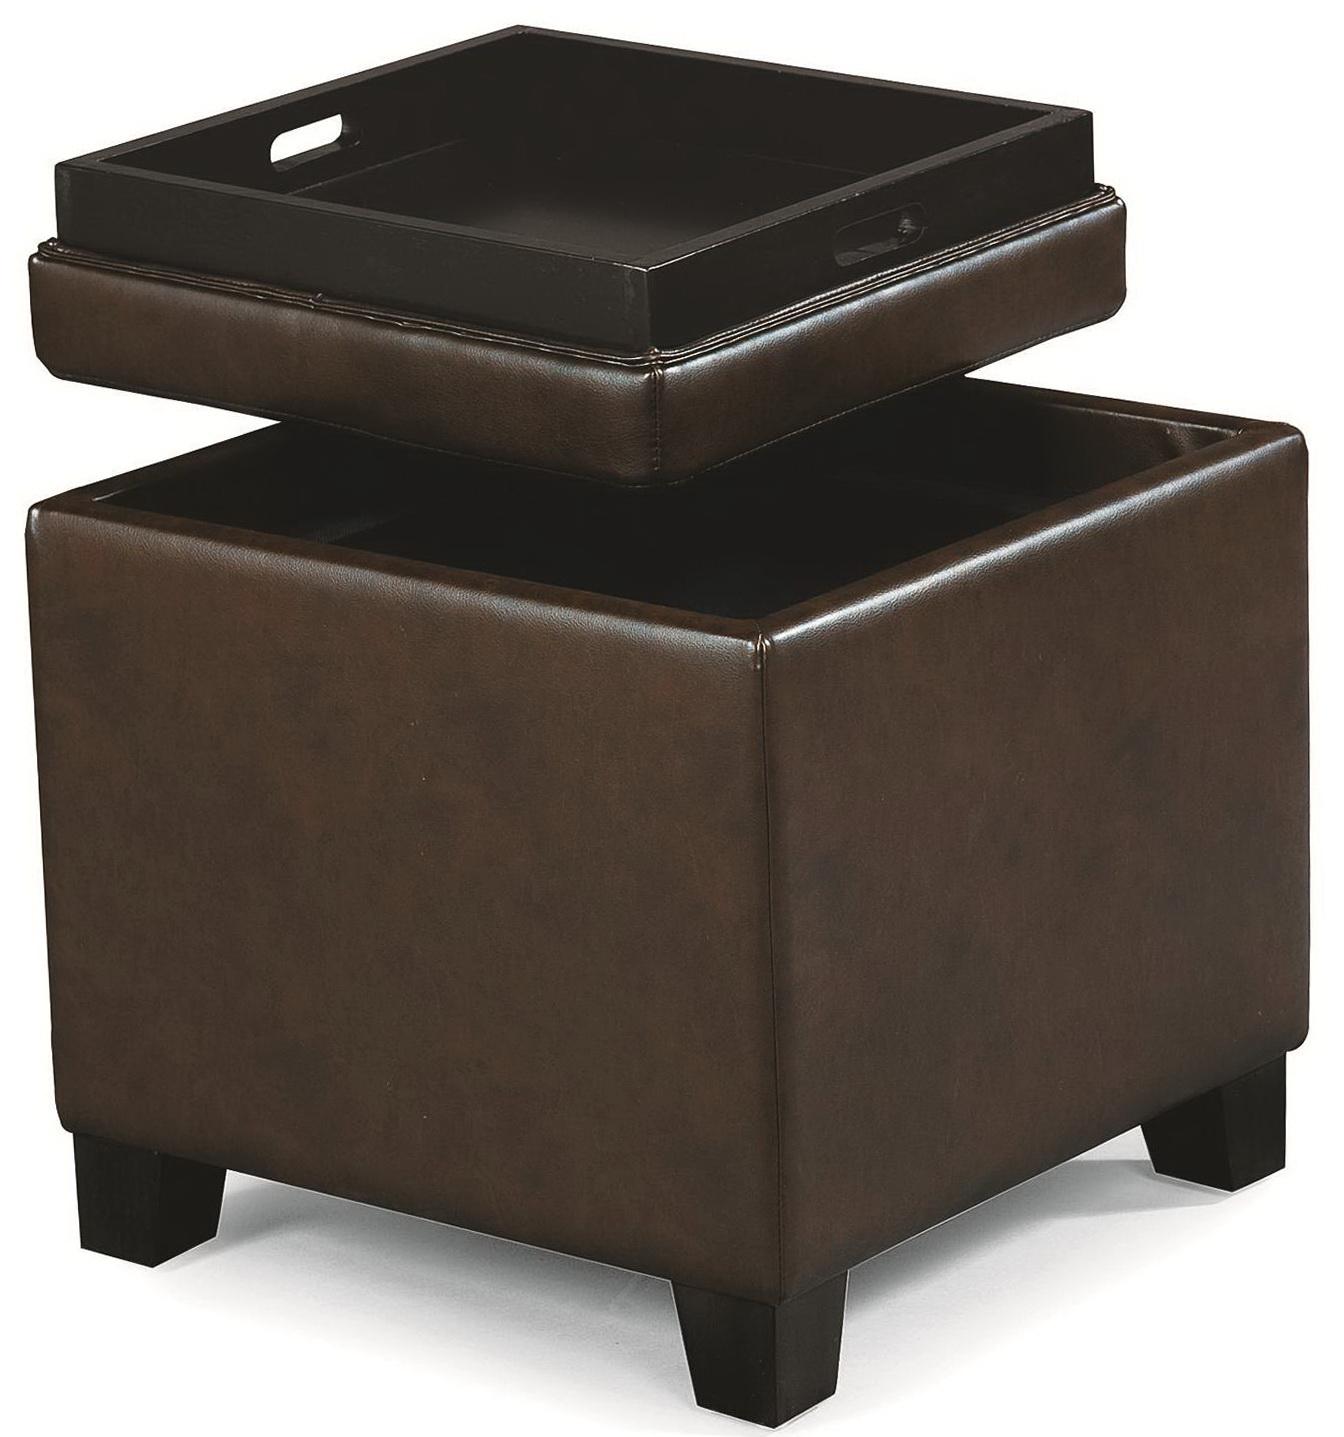 Brown Leather Storage Ottoman Tray